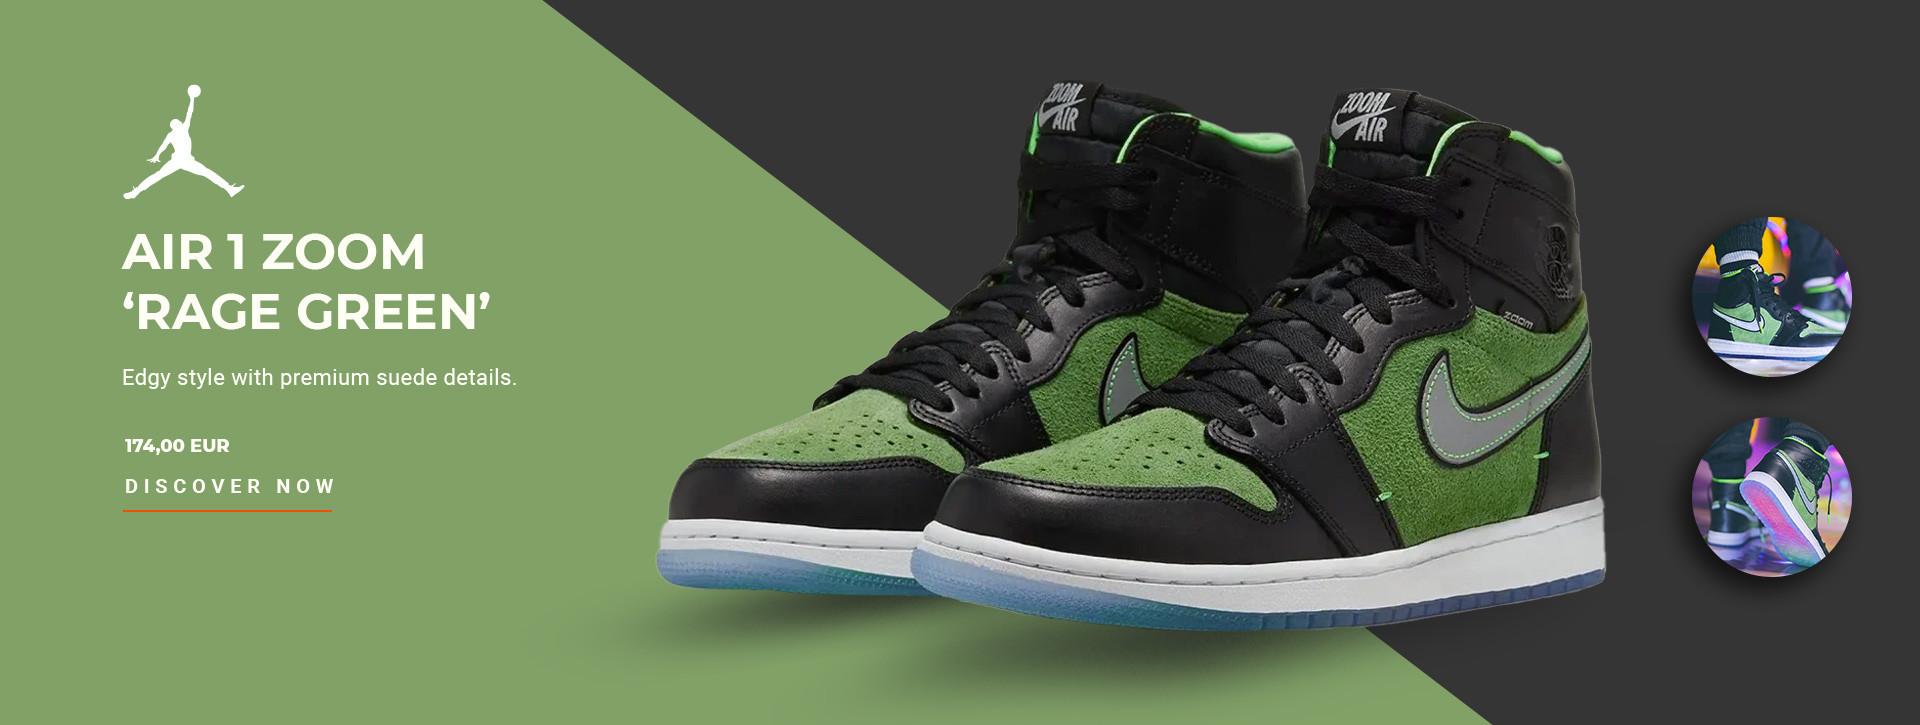 Jordan Rage Green